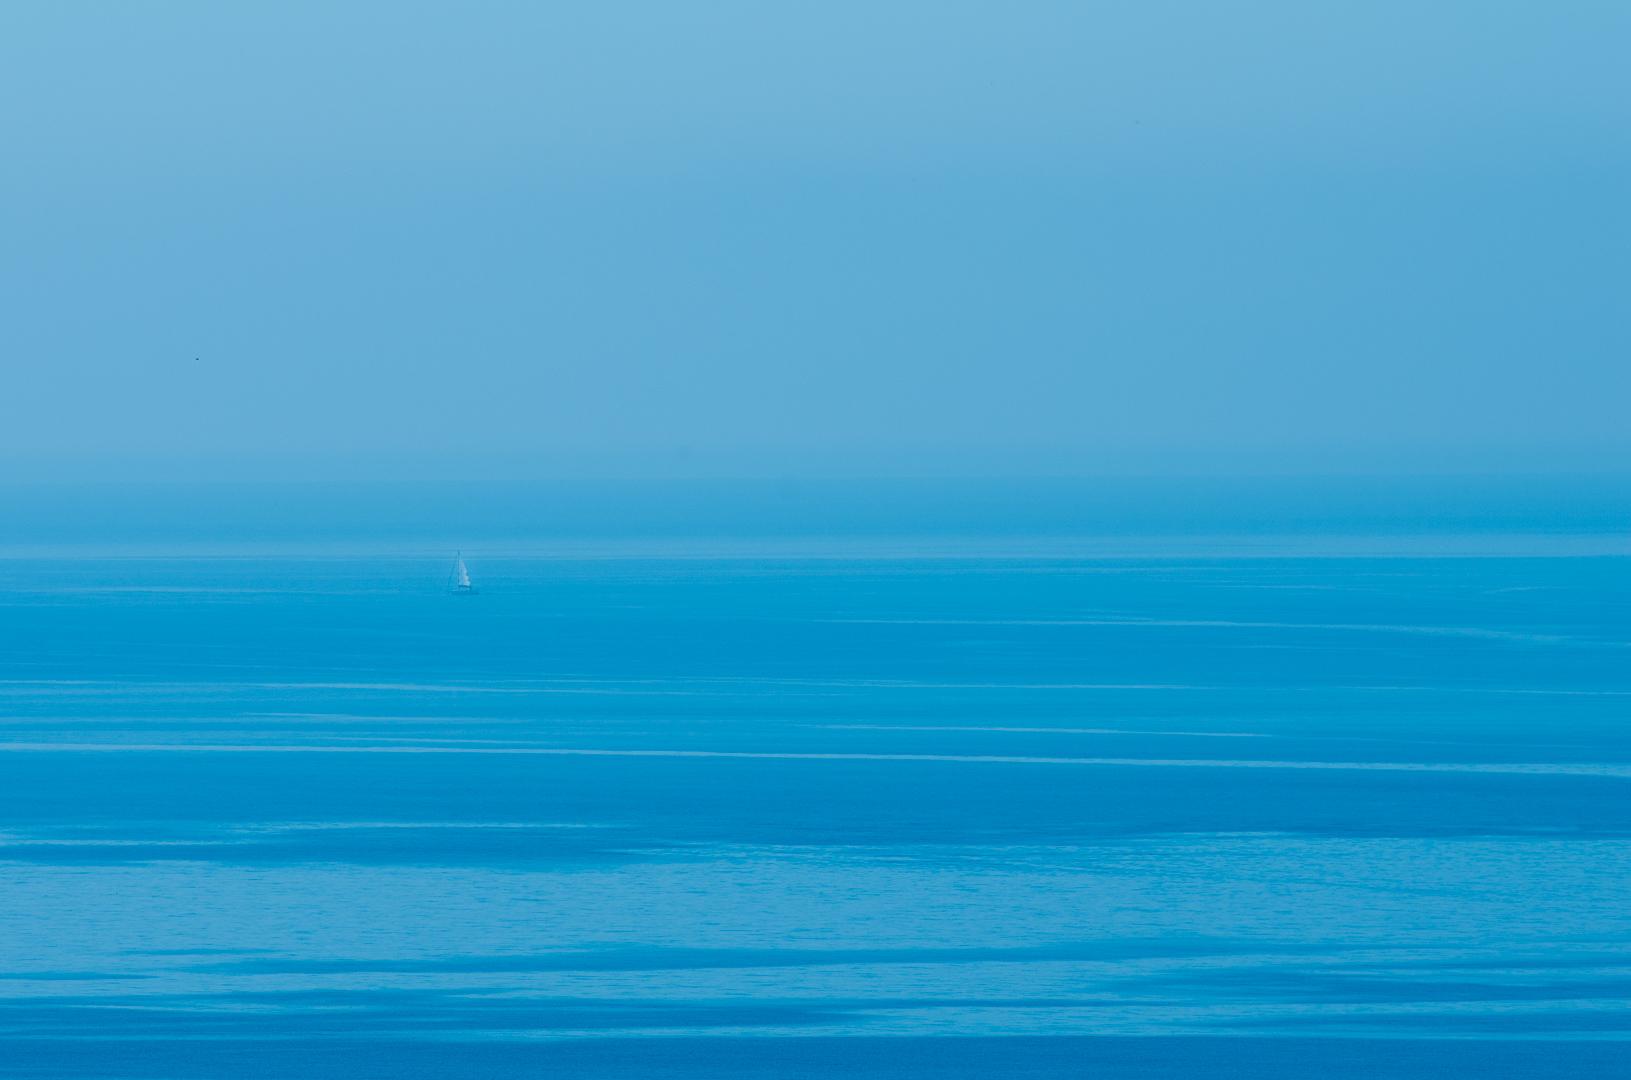 Ohne Horizont - Matthias Kullik